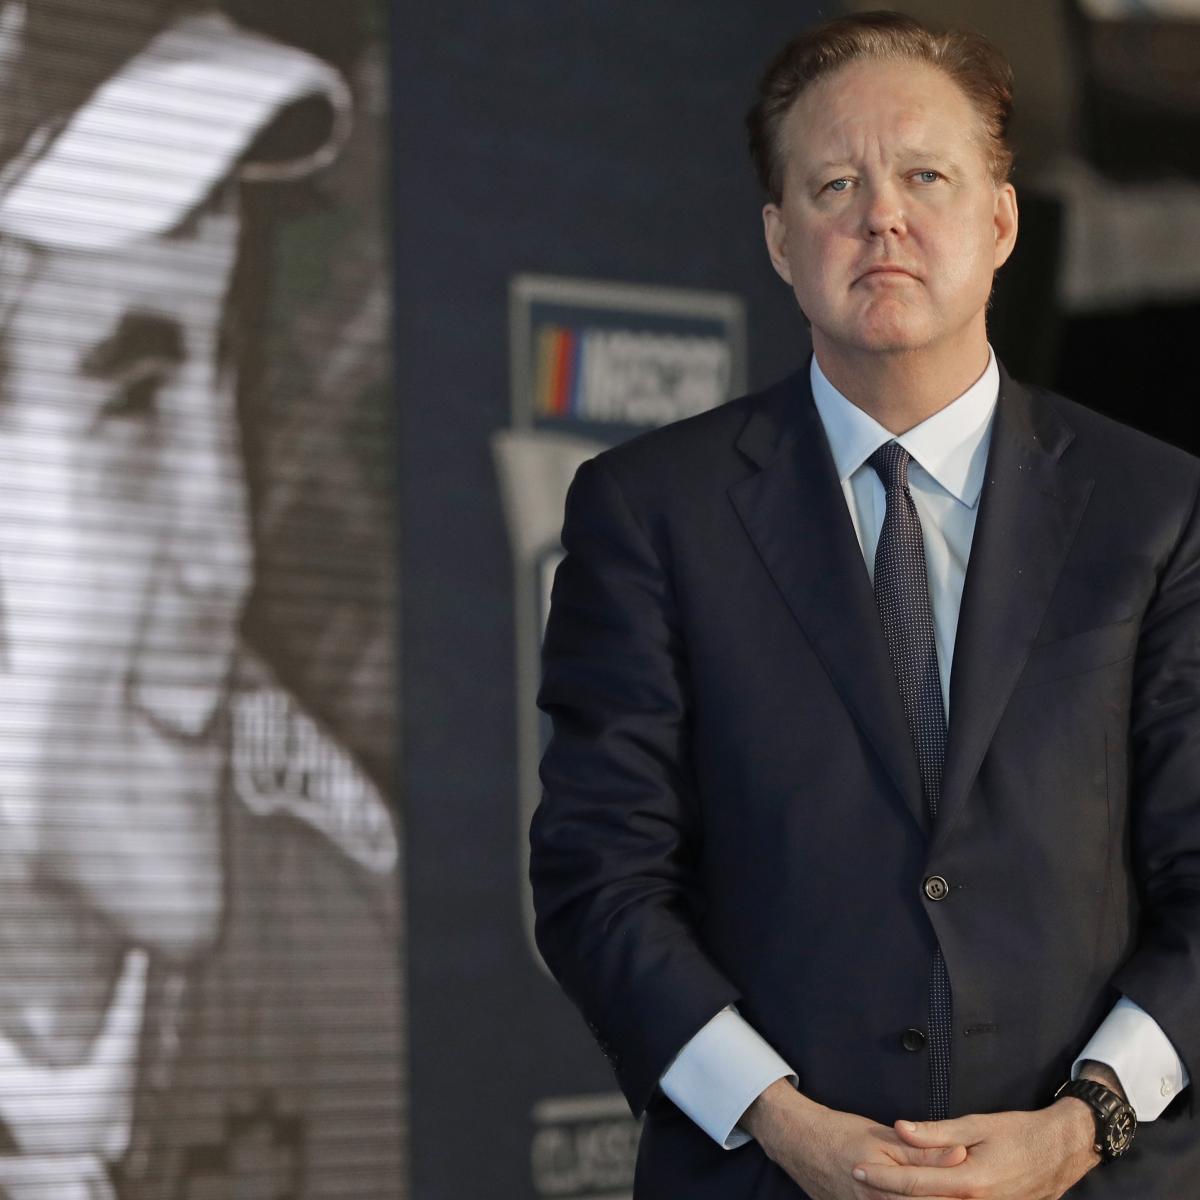 TMZ: NASCAR CEO Brian France Arrested For DUI, Name